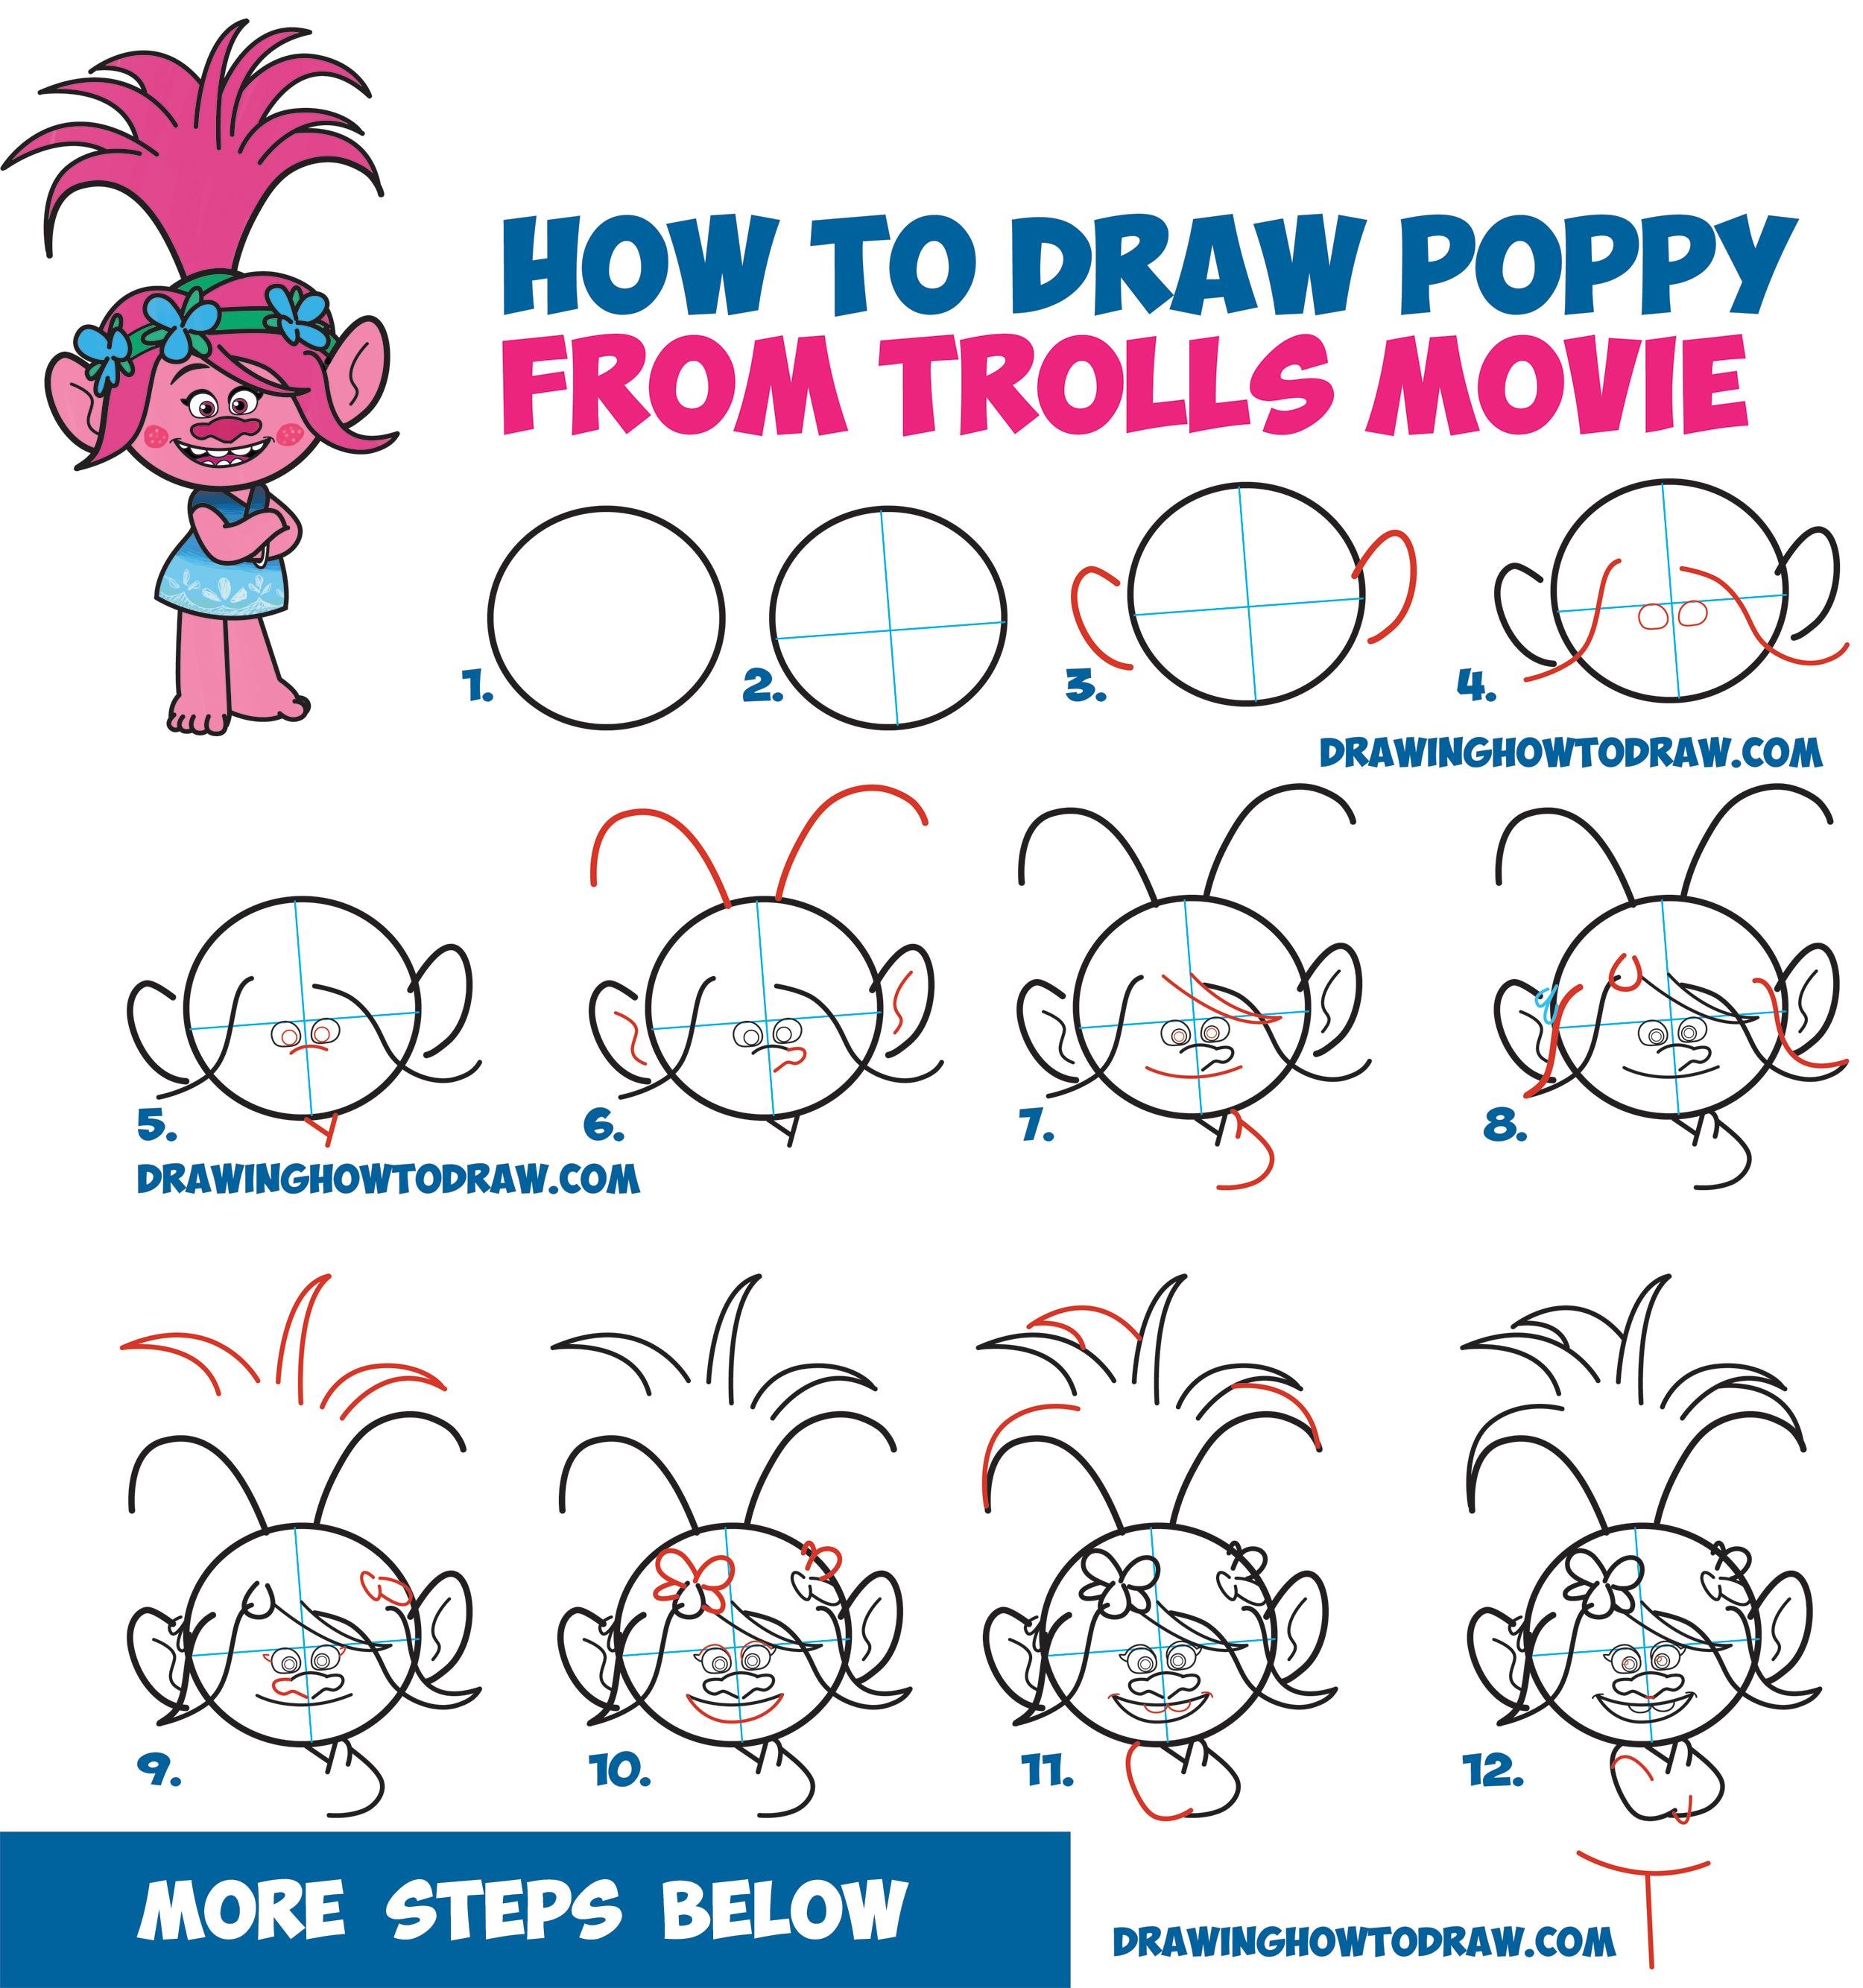 Drawn poppy beginner Drawing Movie Easy How How